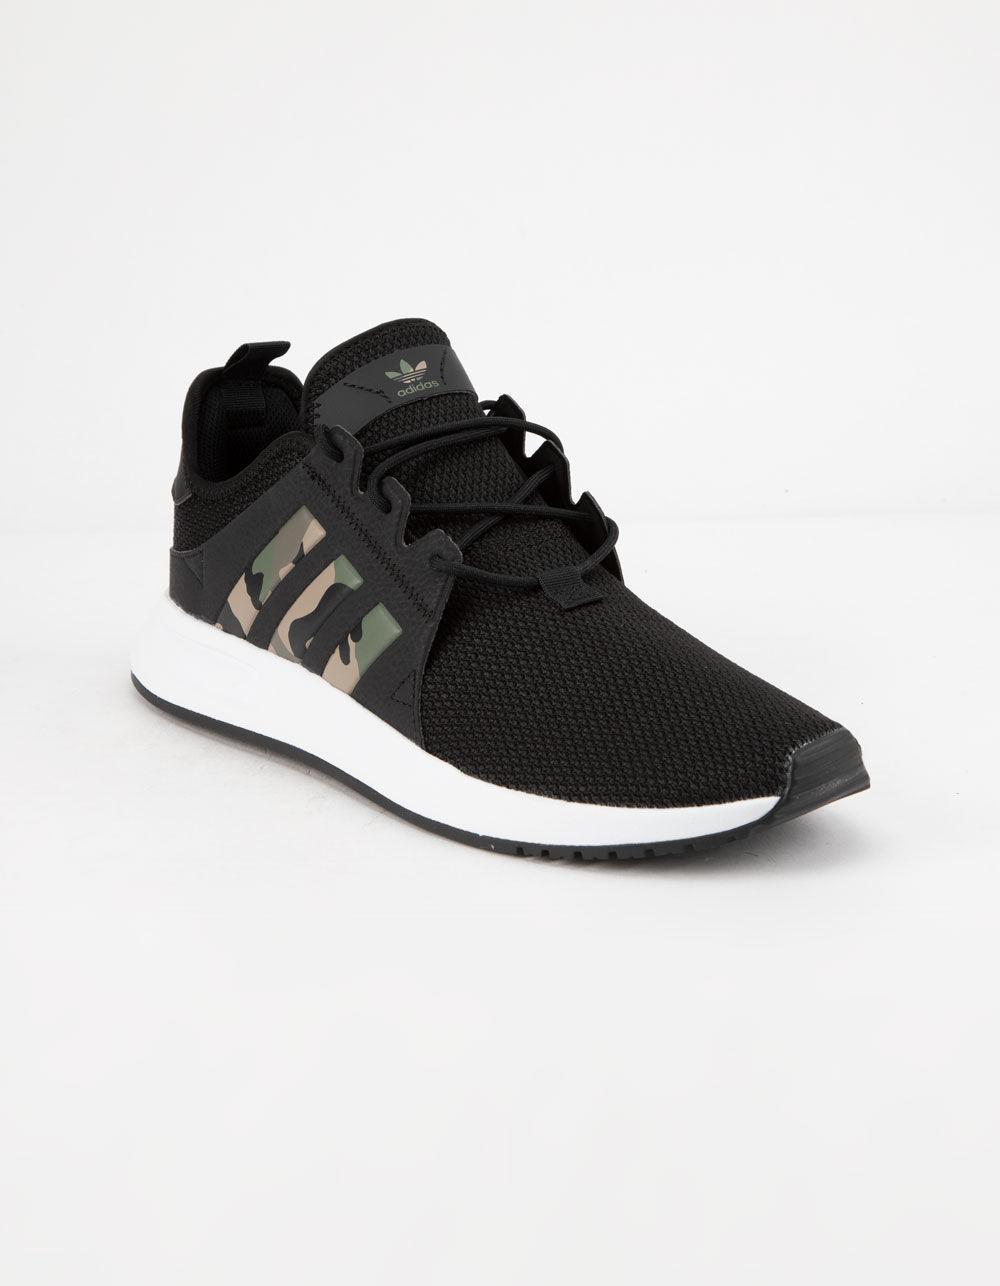 08d664552aa Lyst - adidas X plr Core Black   Camo Shoes in Black for Men